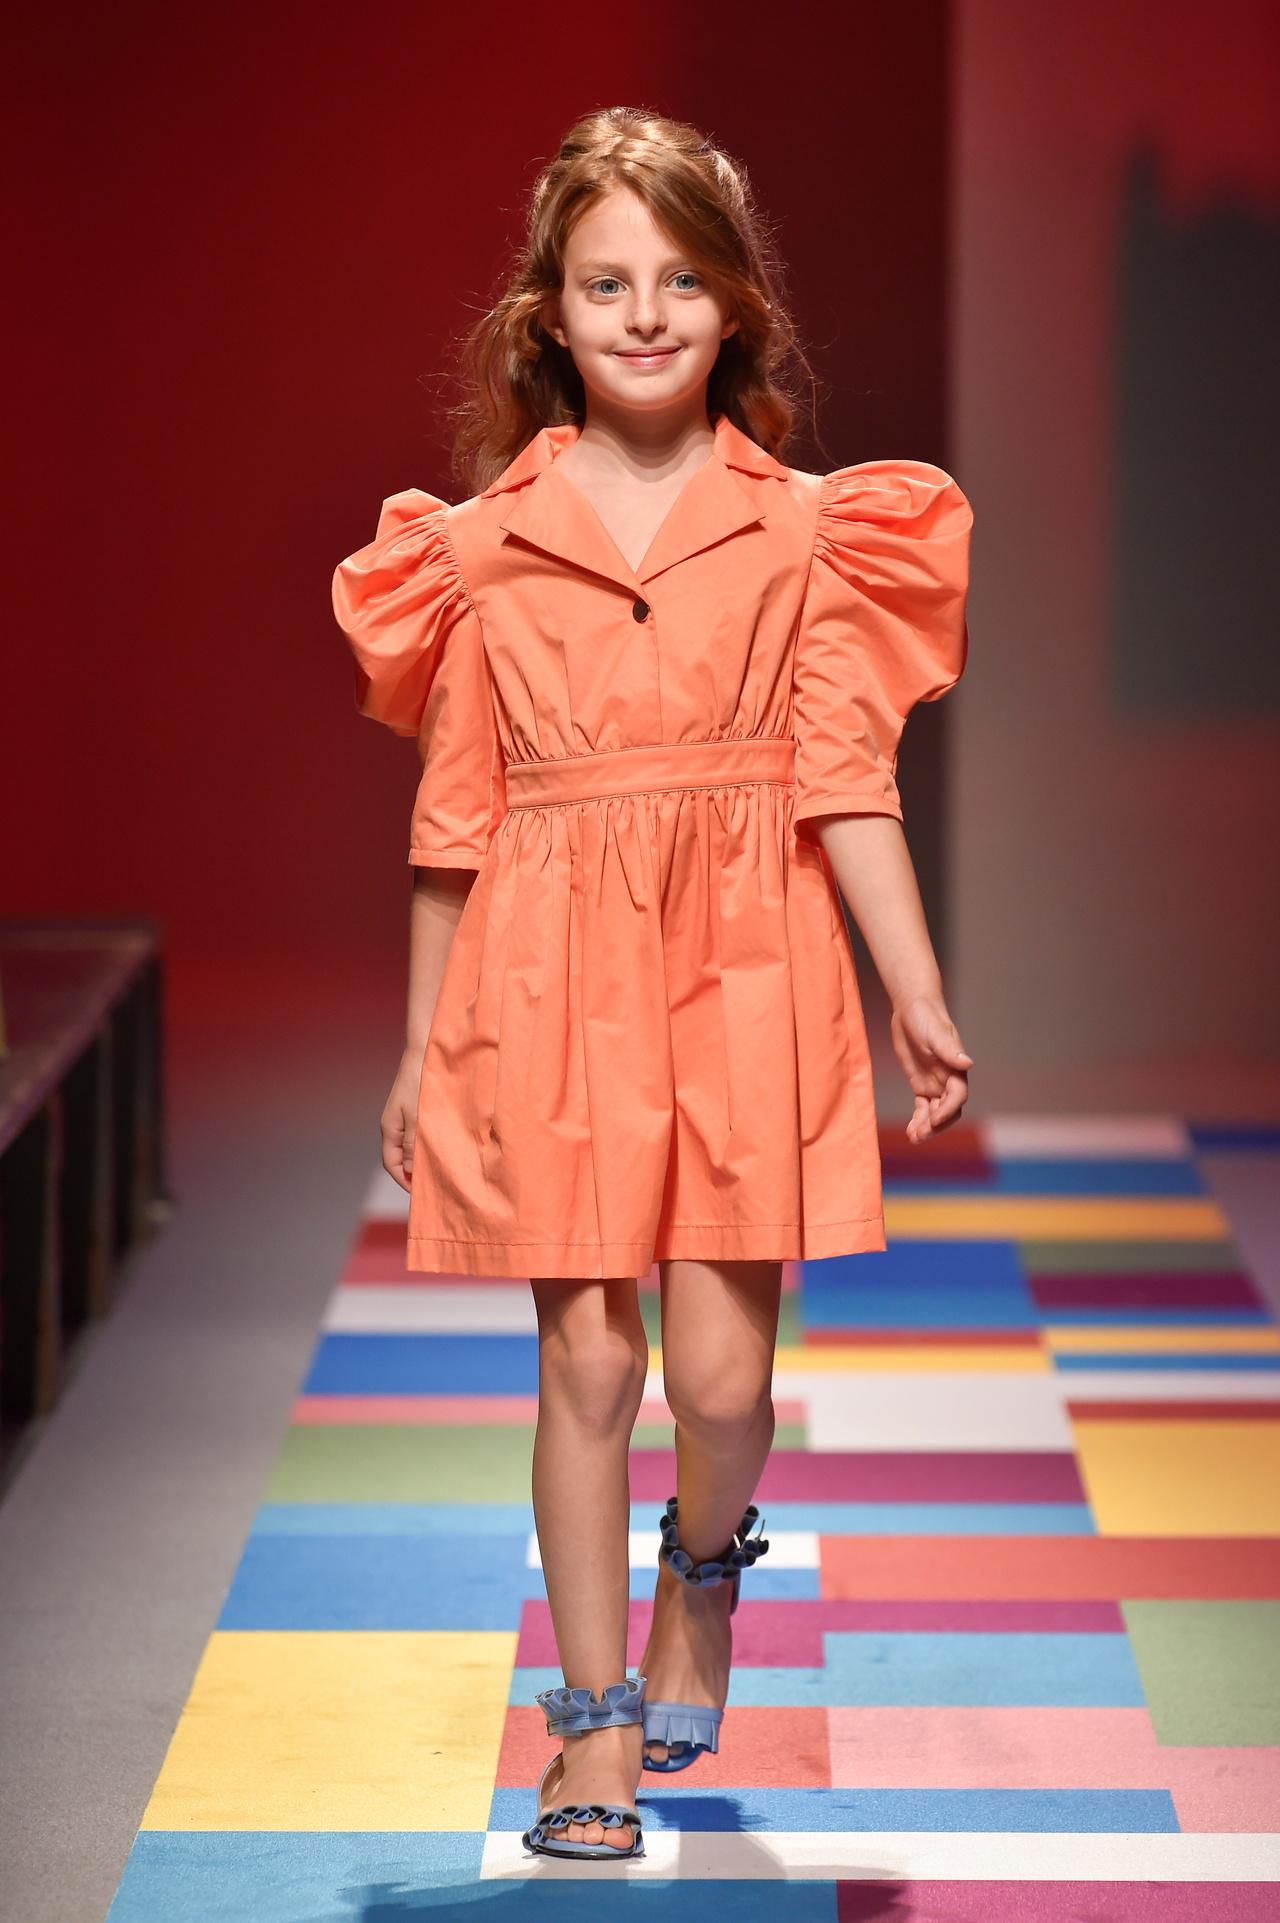 Copy of Taylor Dress.JPG